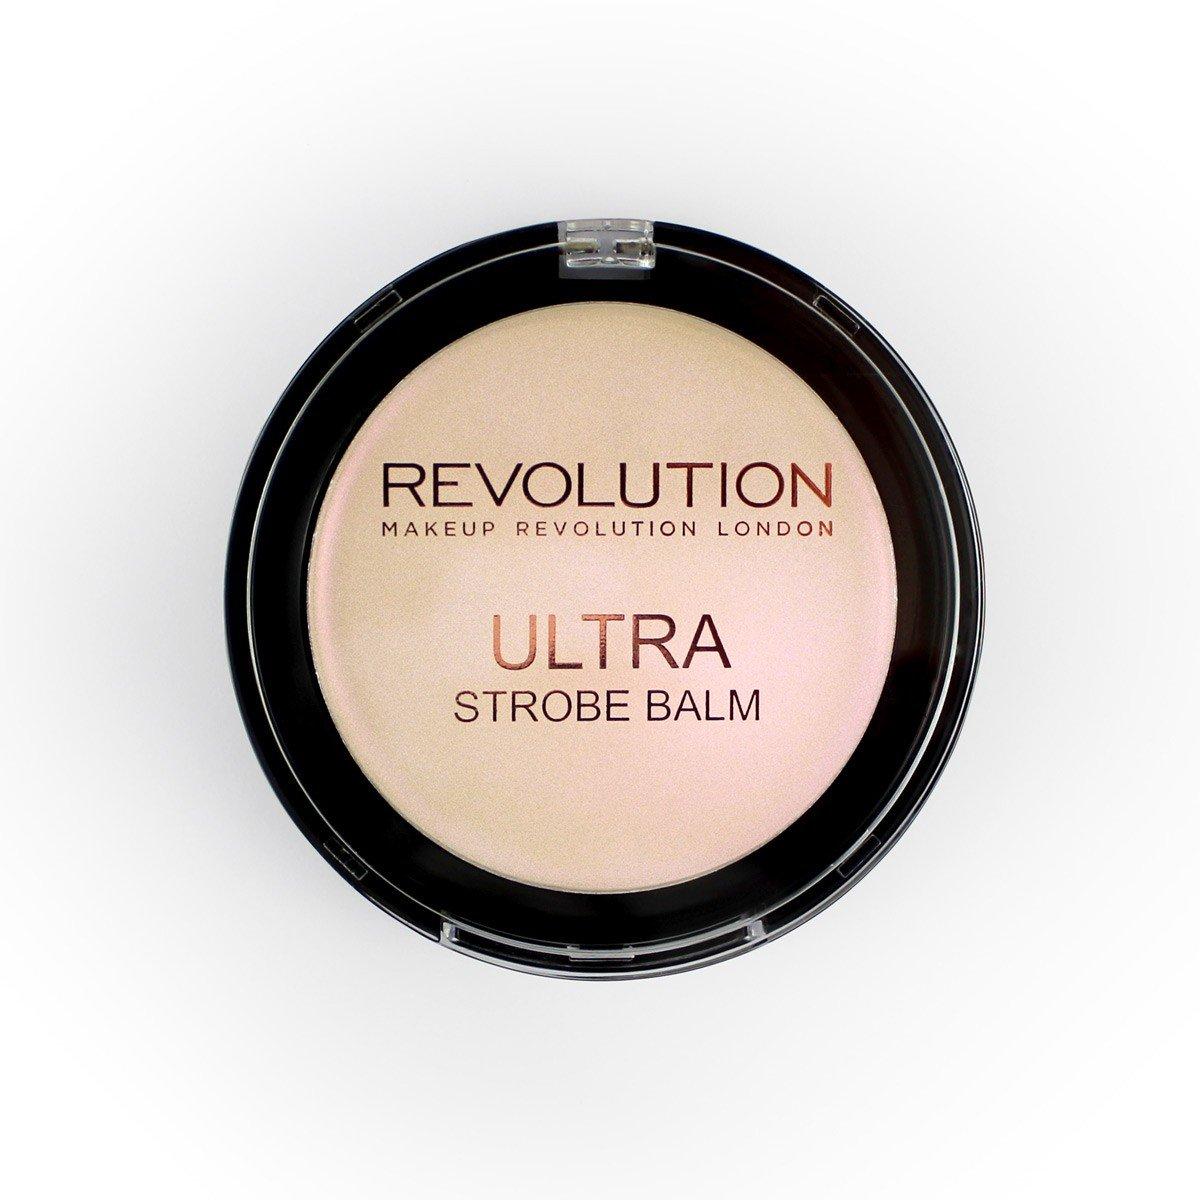 Makeup Revolution Ultra Strobe Balm, Euphoria